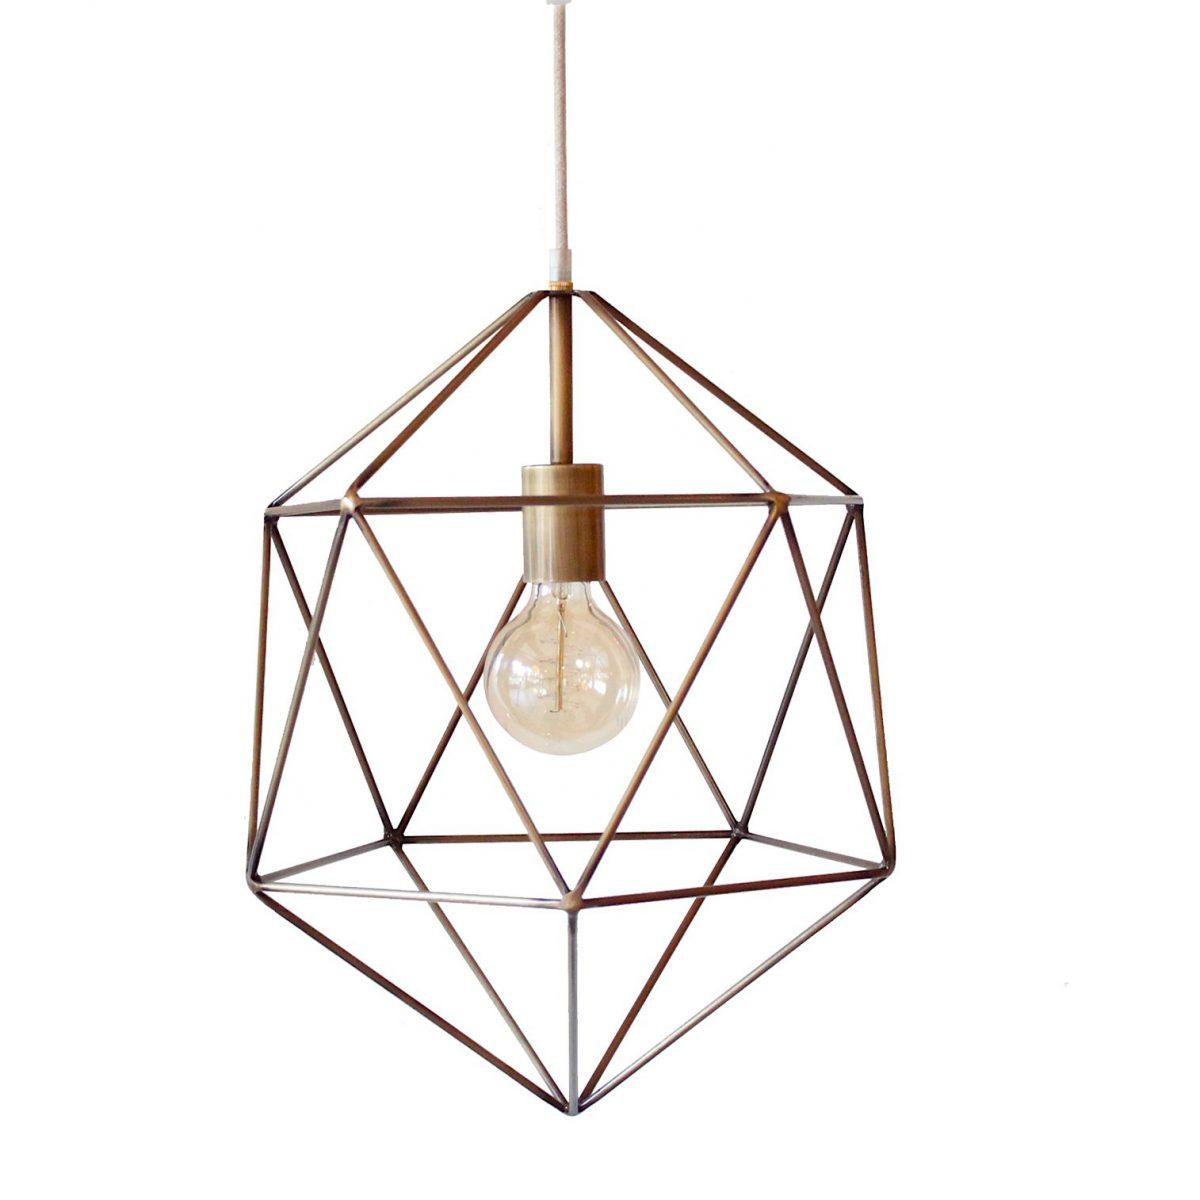 Geometric-Pendant-Light-Polyhedron.jpg